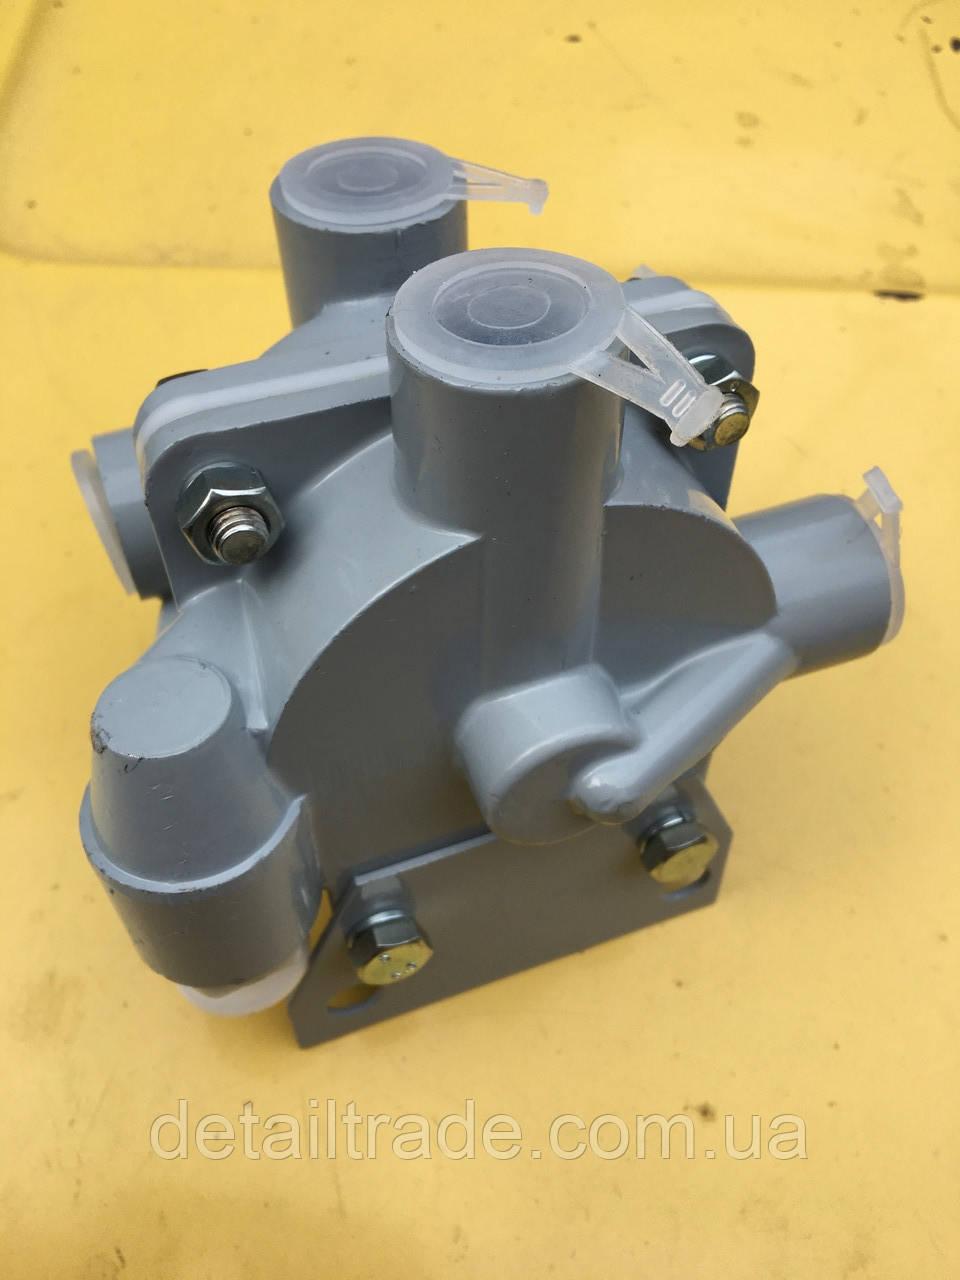 Тормозной кран 2ПТС-4